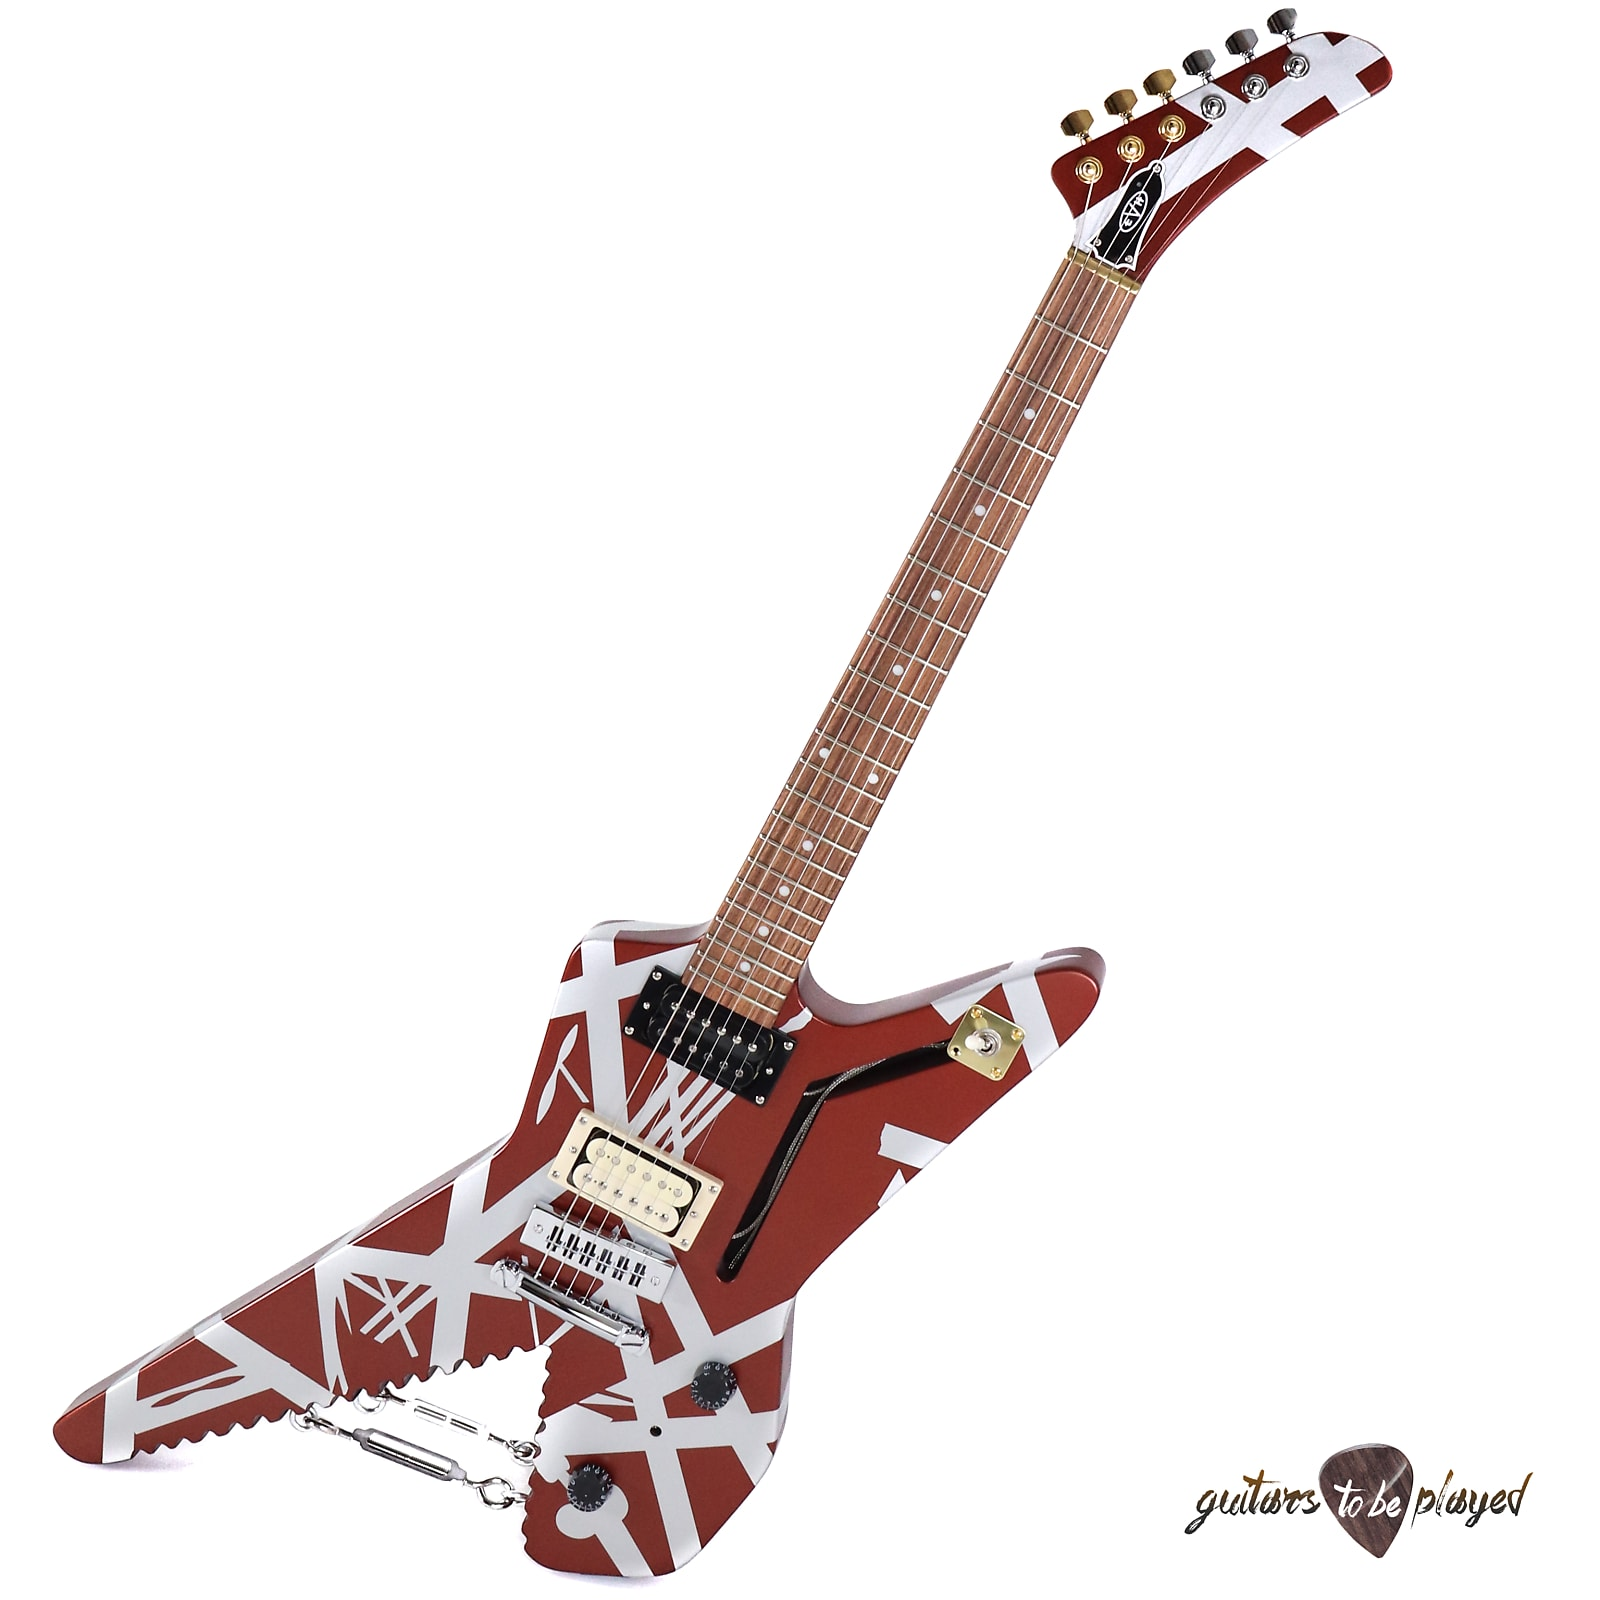 EVH Striped Series Shark Eddie Van Halen Electric Guitar - Burgundy w/  Stripes